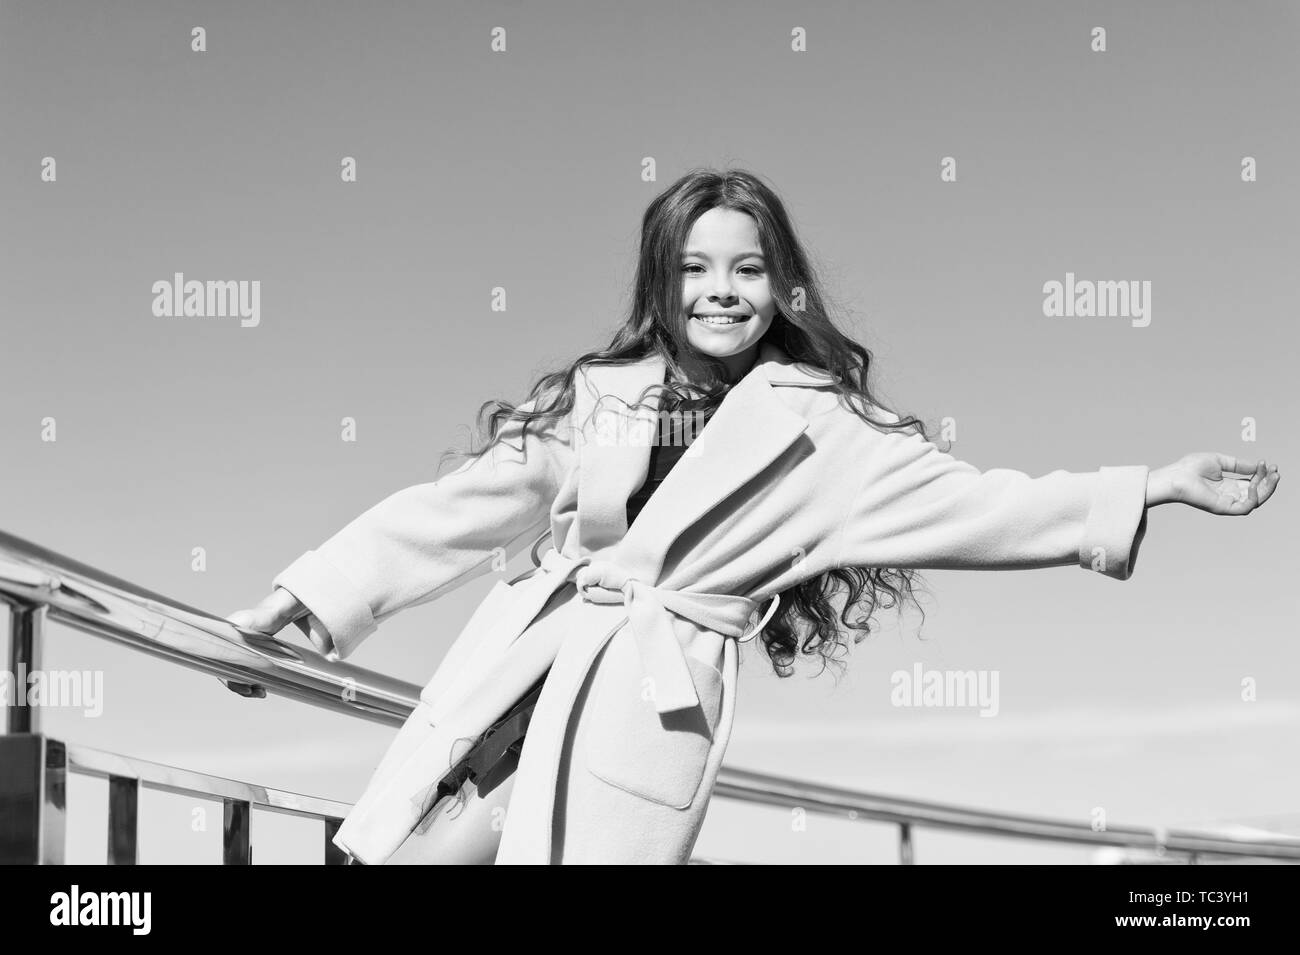 Kid girl long hair enjoy walk sunny day blue sky background. Girl carefree childhood walk. Charming little stylish fashionable girl. Feeling free and happy. Little child enjoy sunny walk. Happy day. Stock Photo